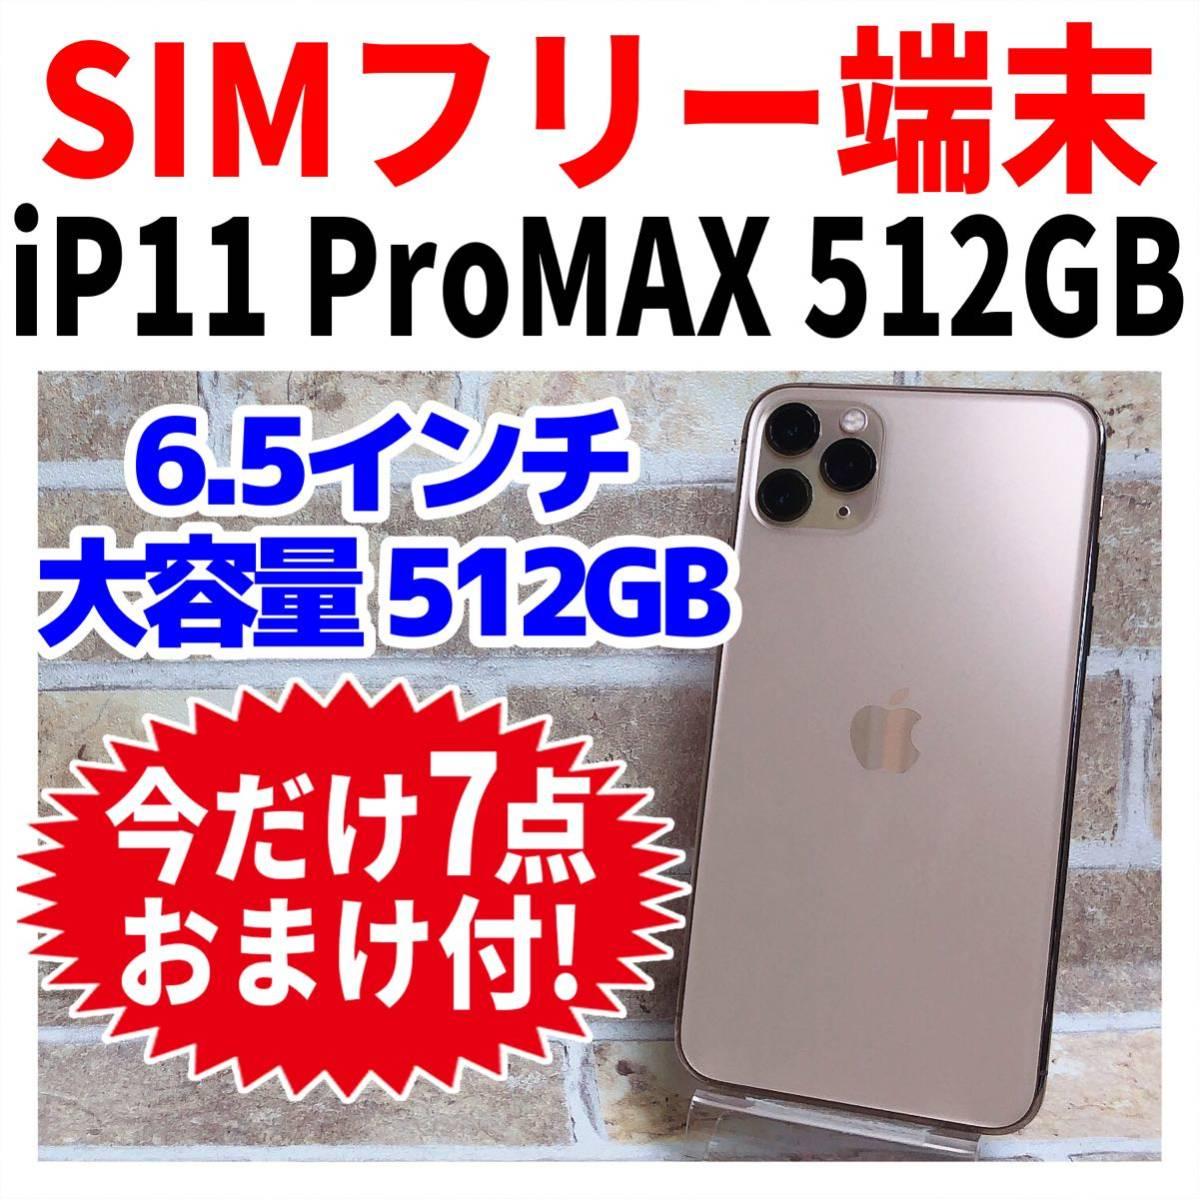 SIMフリー iPhone11ProMax 512GB 276 ゴールド 電池良好 完全動作品_画像1